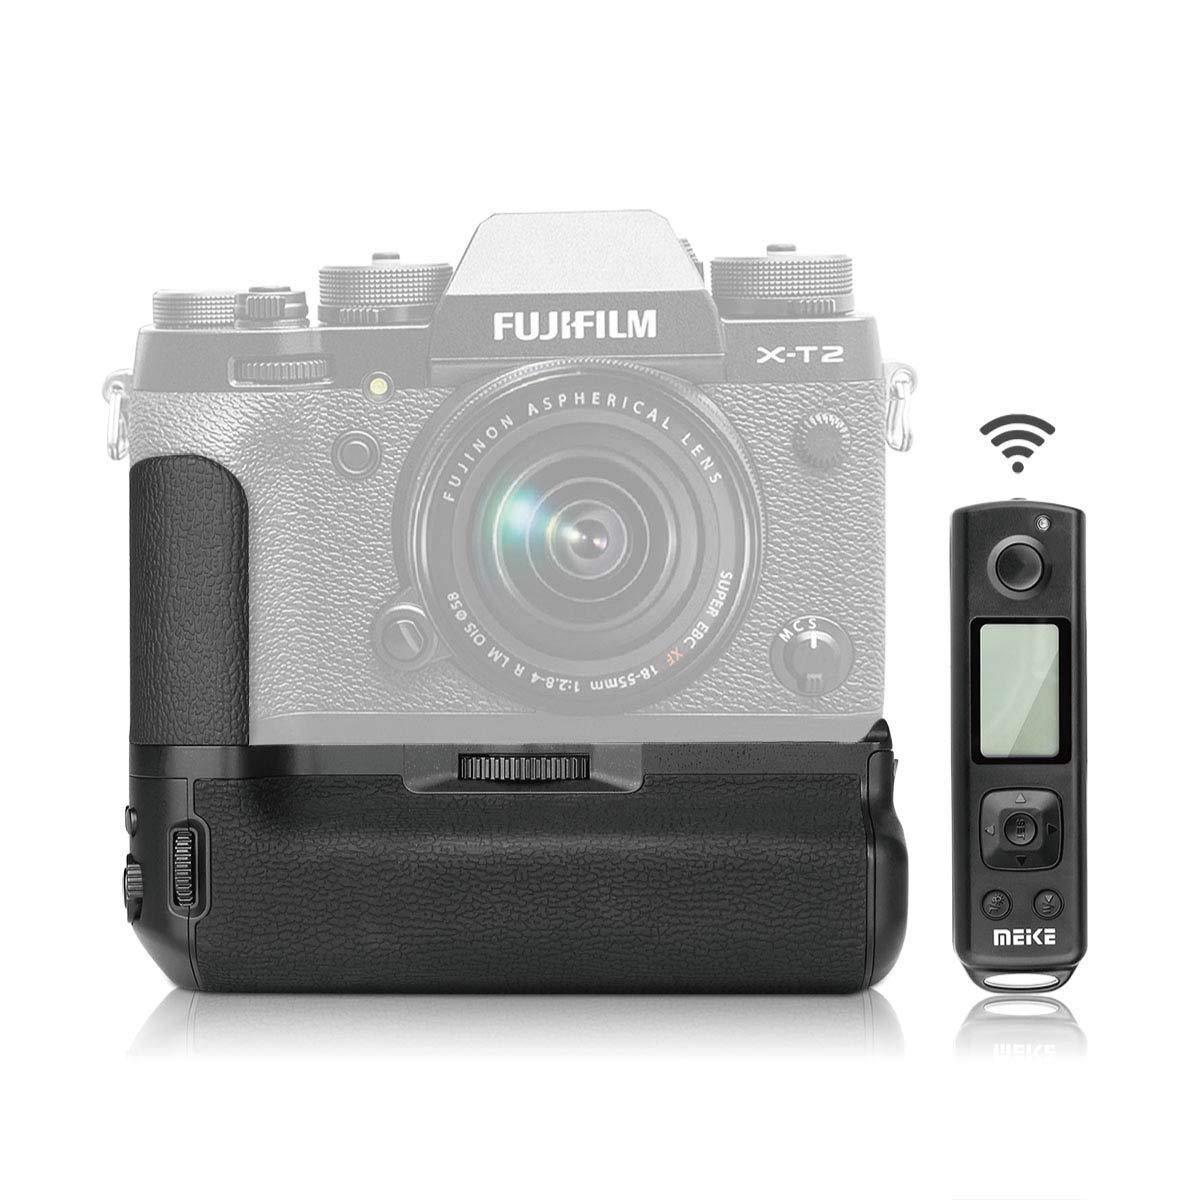 Meike MK-XT2プロプロフェッショナルバッテリグリップ、富士フイルムX-T2カメラグリップ用2.4G 100mワイヤレスリモコン搭載   B07KNQNL8D